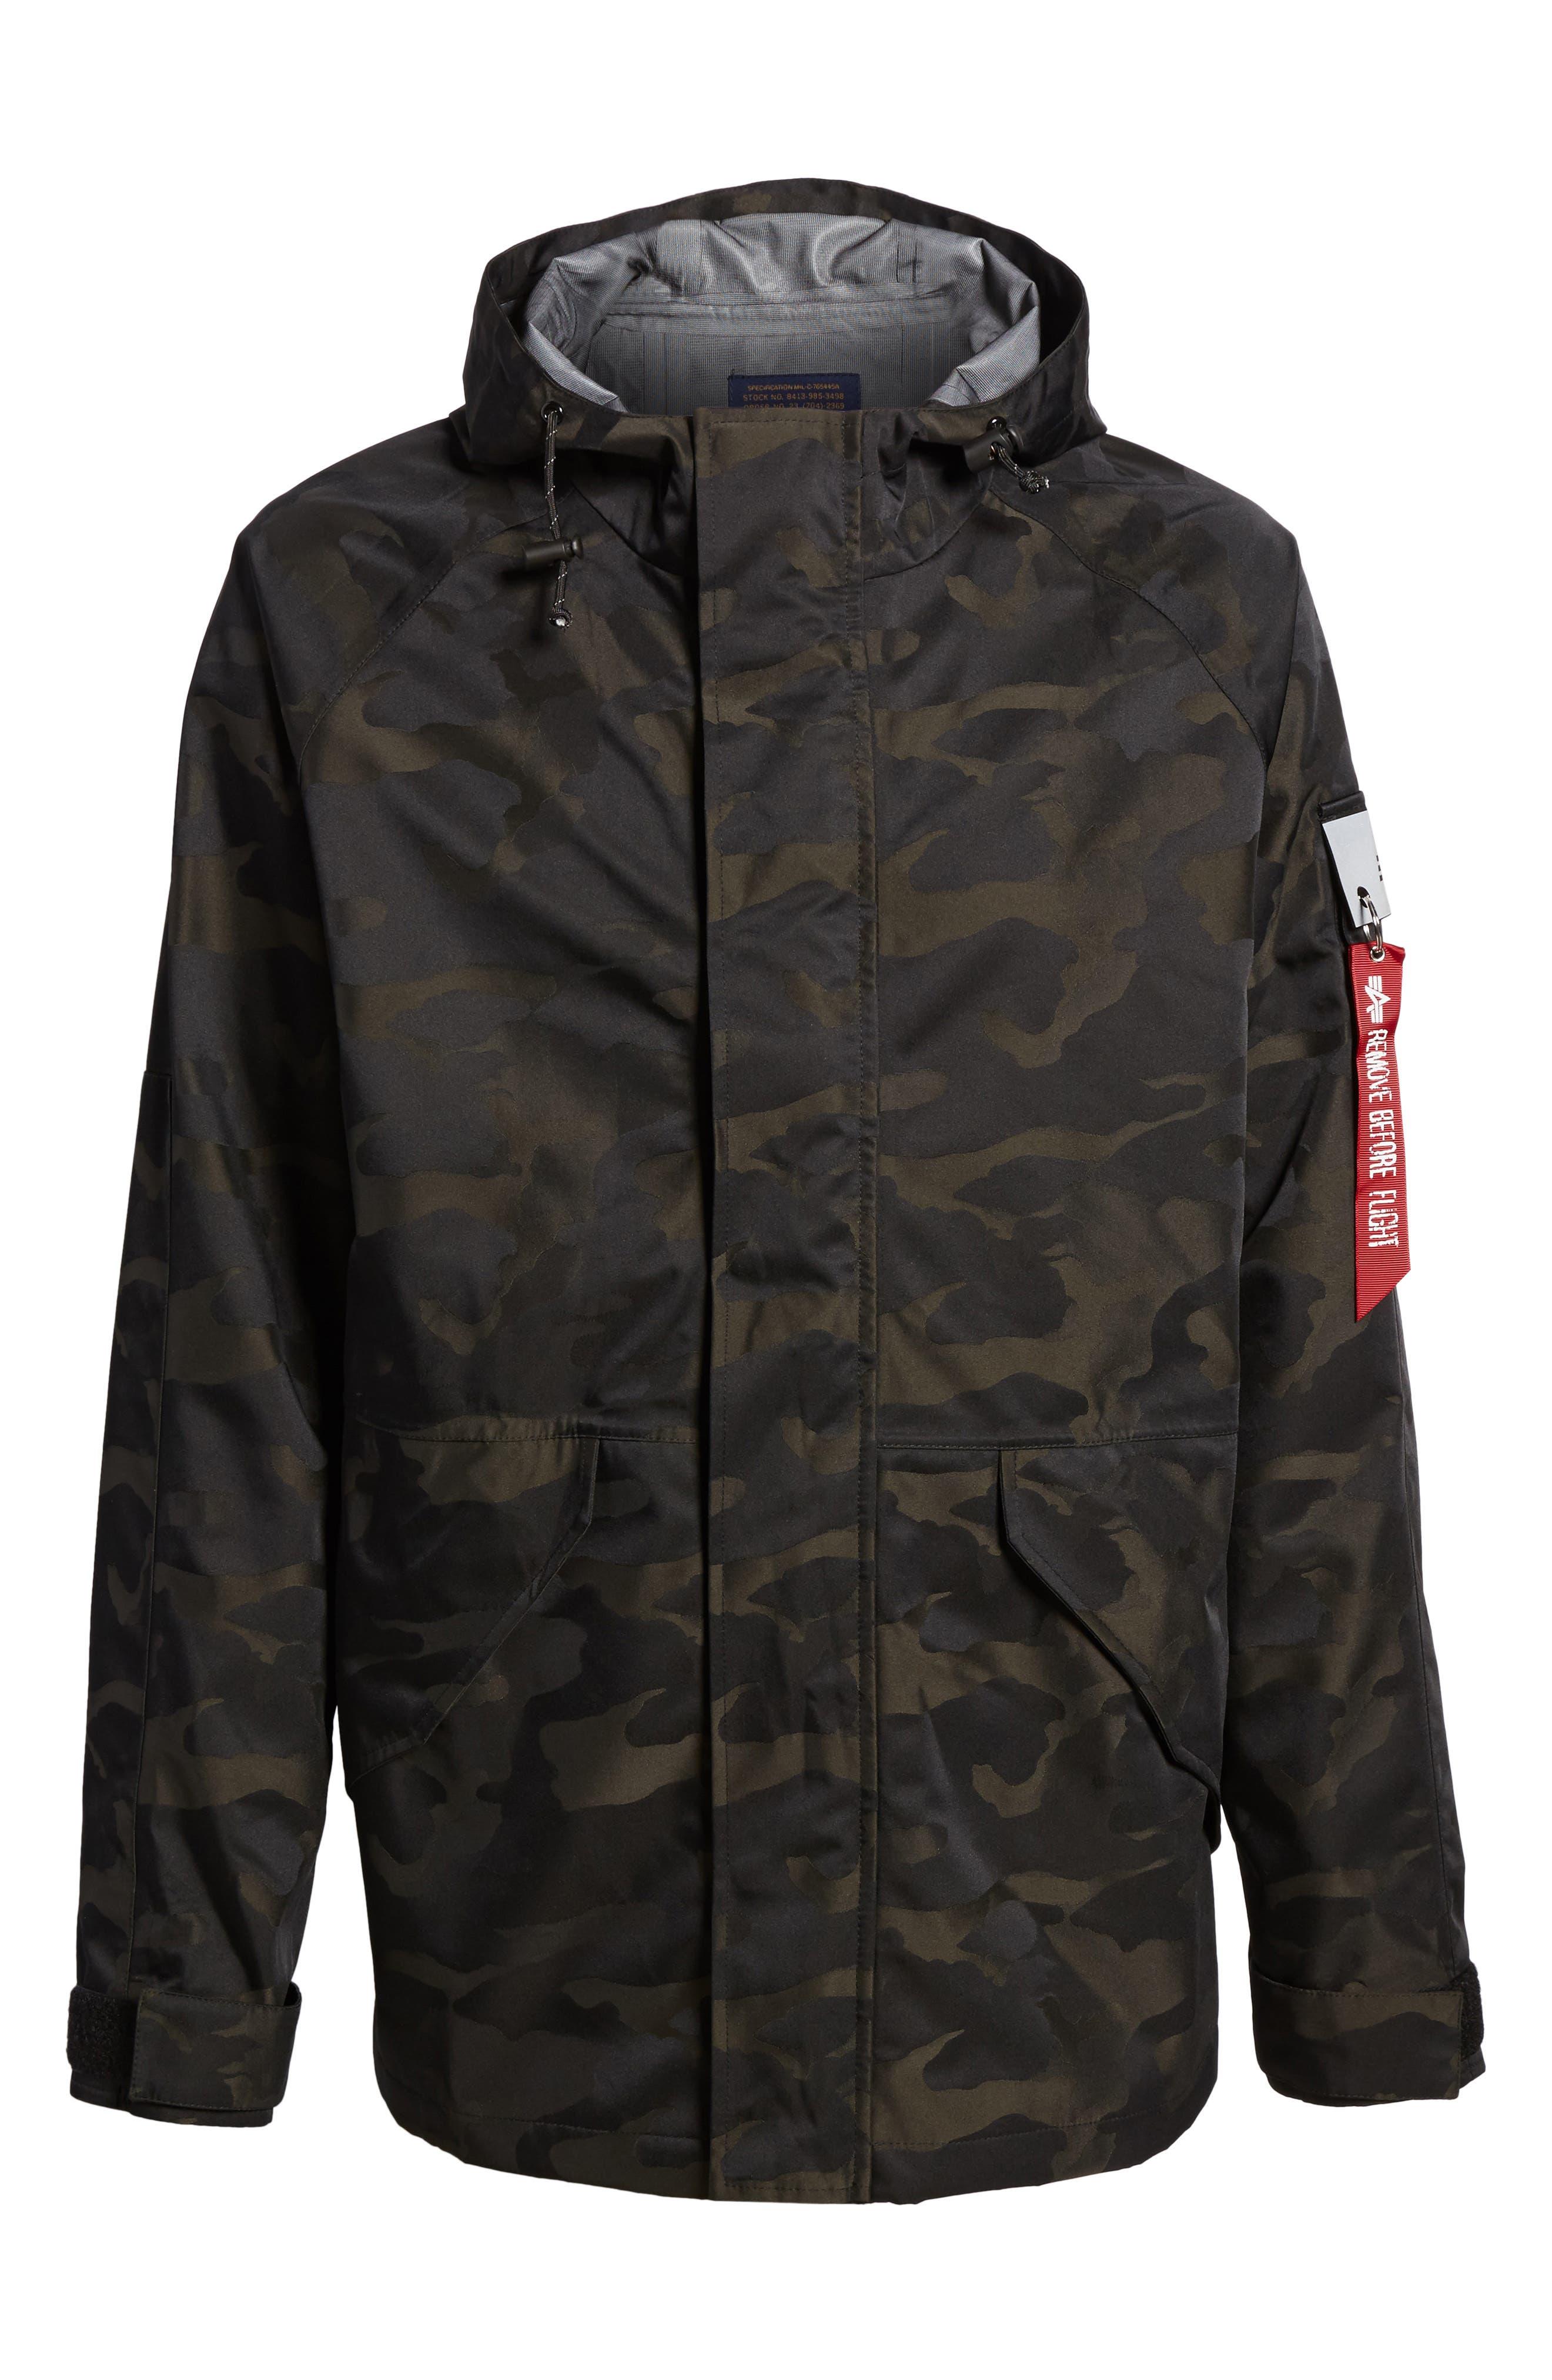 Torrent Camo Jacket,                             Alternate thumbnail 6, color,                             Black Camo